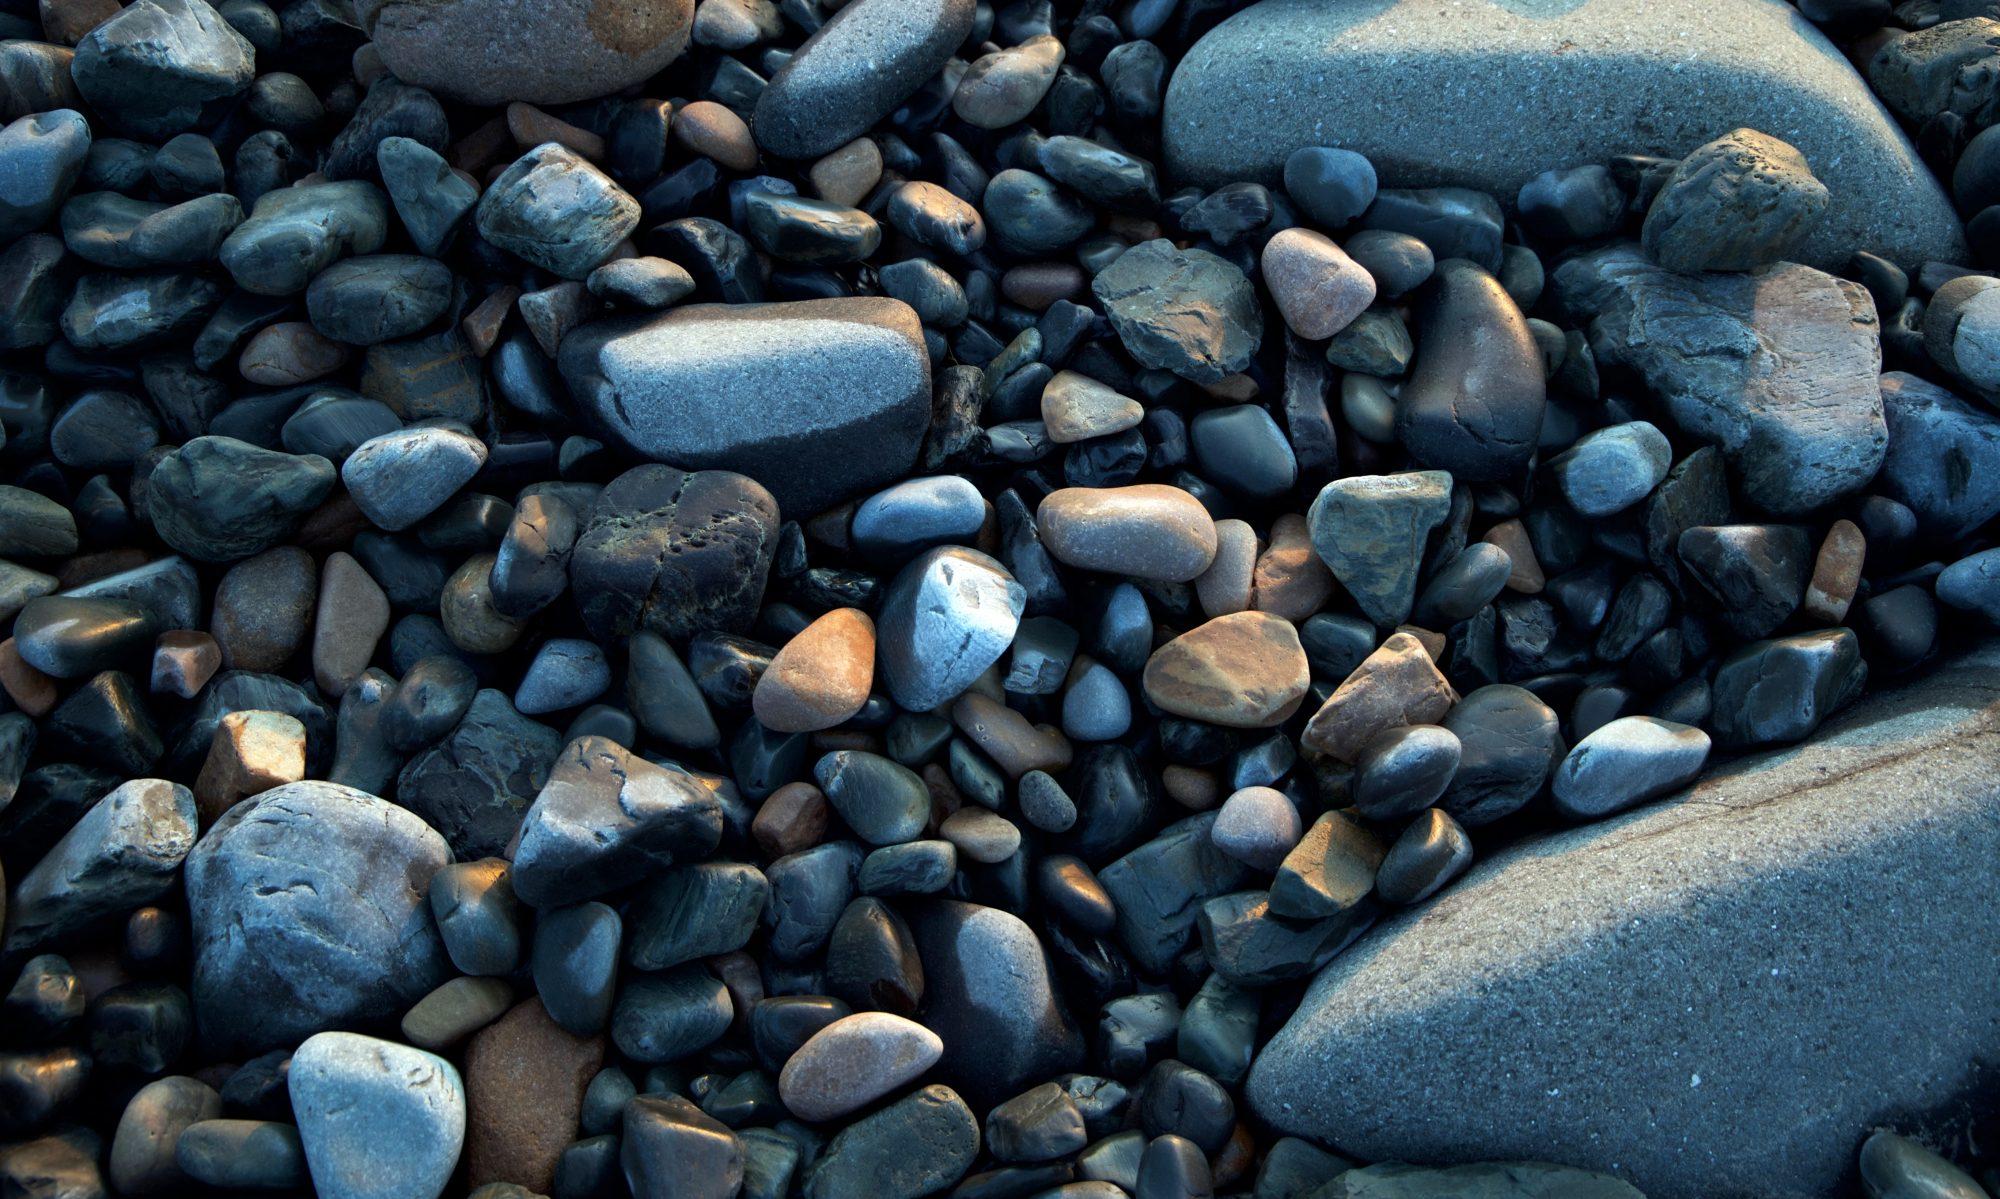 Bocks of Rocks